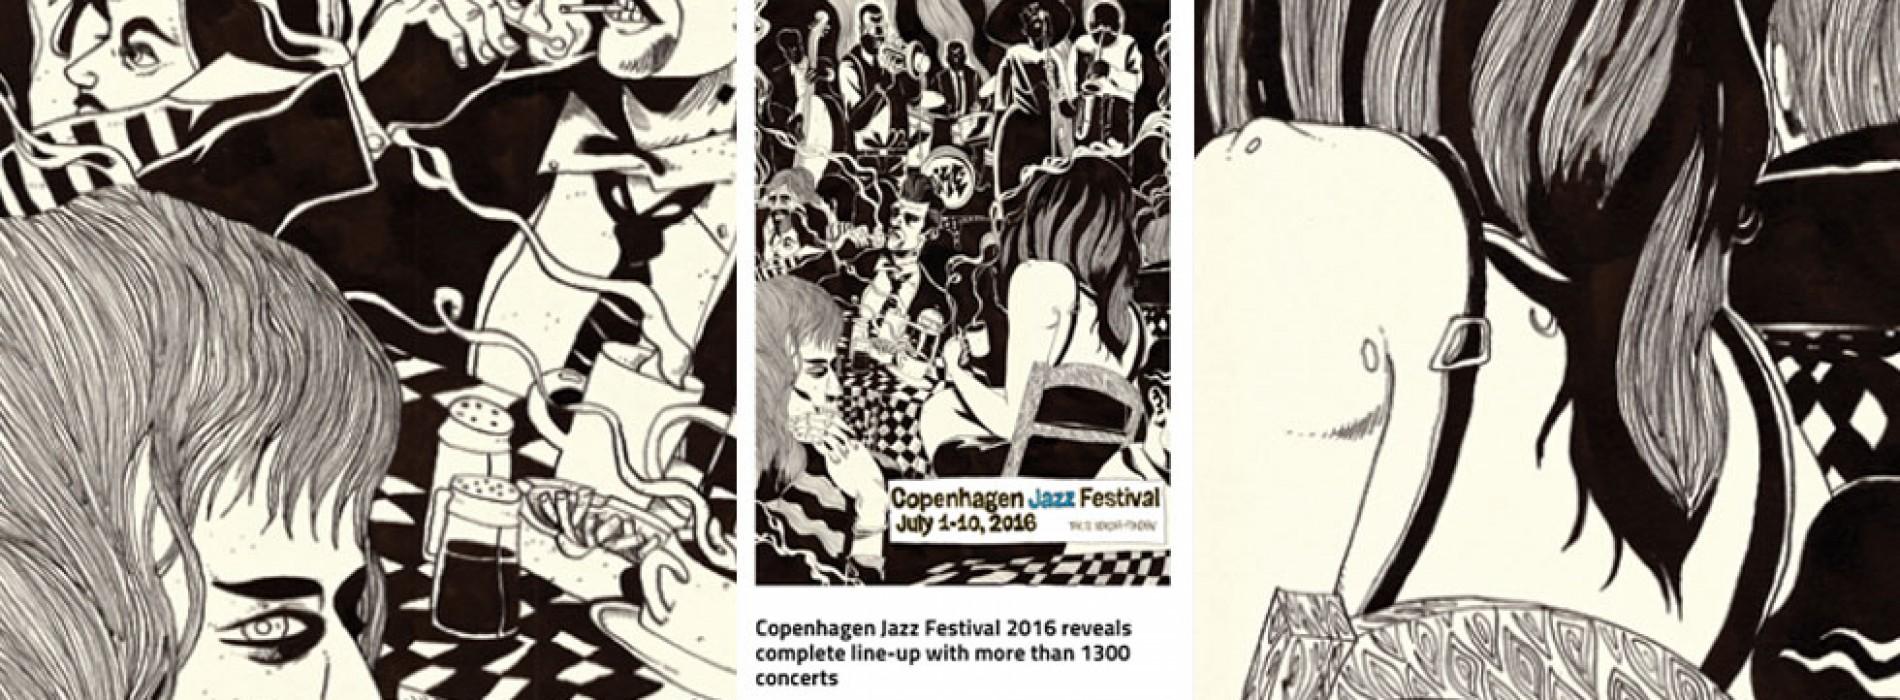 Copenhagen Jazz Festival 2016 reveals complete line-up with over 1300 concerts